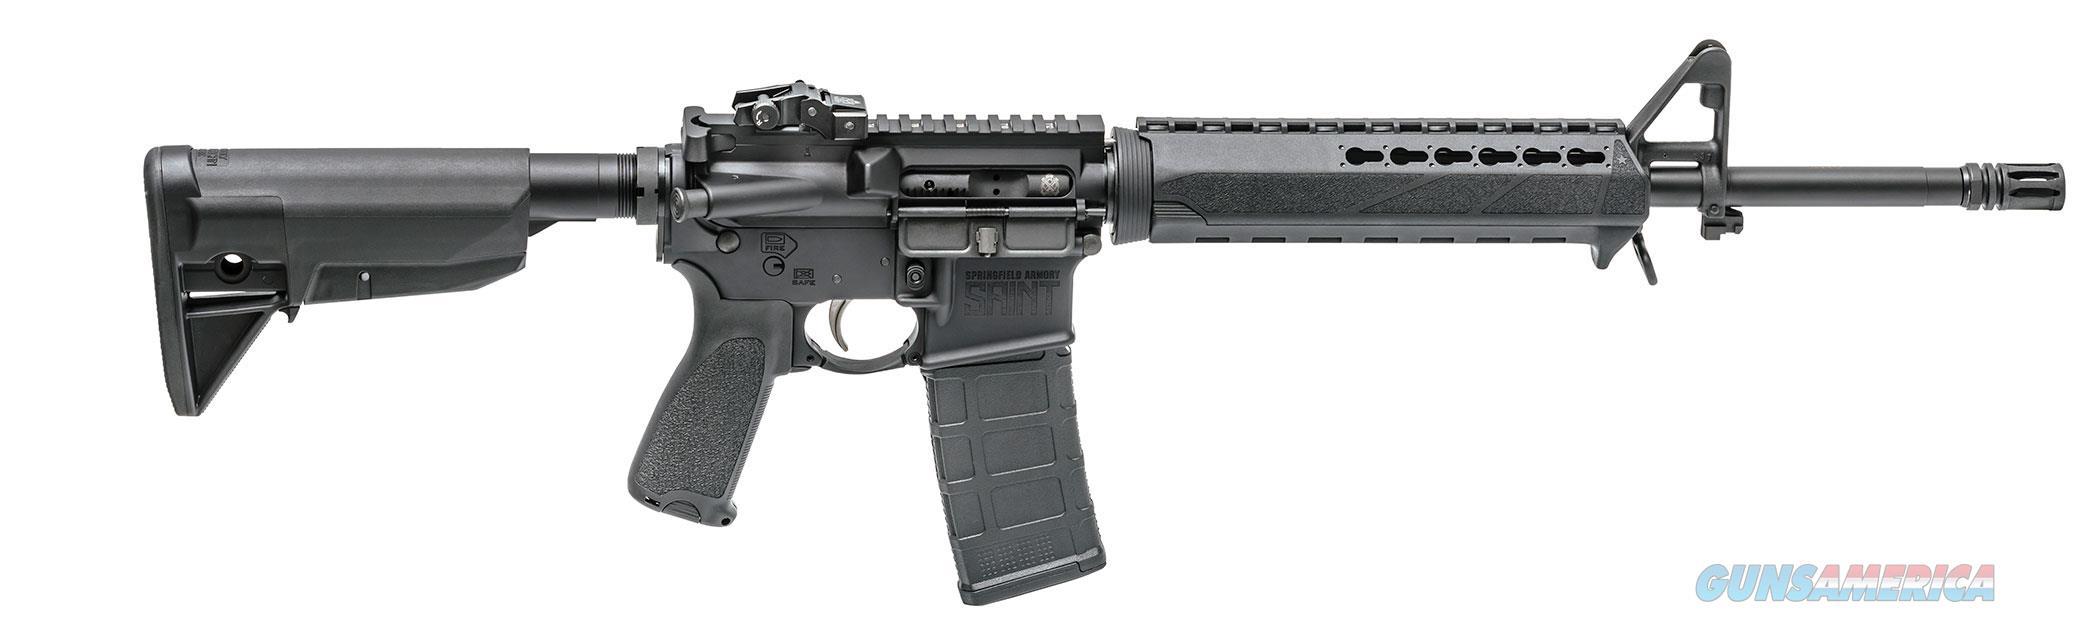 SRPINGFIELD ARMORY SAINT AR-15 M4 5.56 NATO  ST916556B  Guns > Rifles > Springfield Armory Rifles > M1A/M14